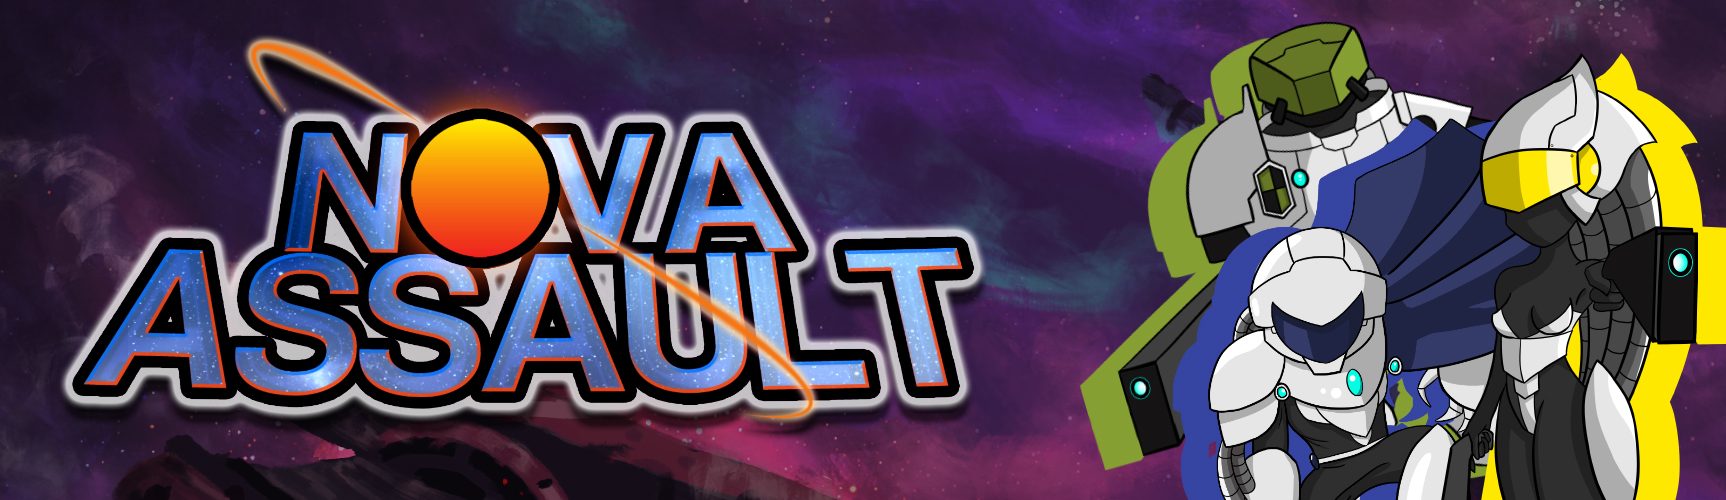 Nova Assault